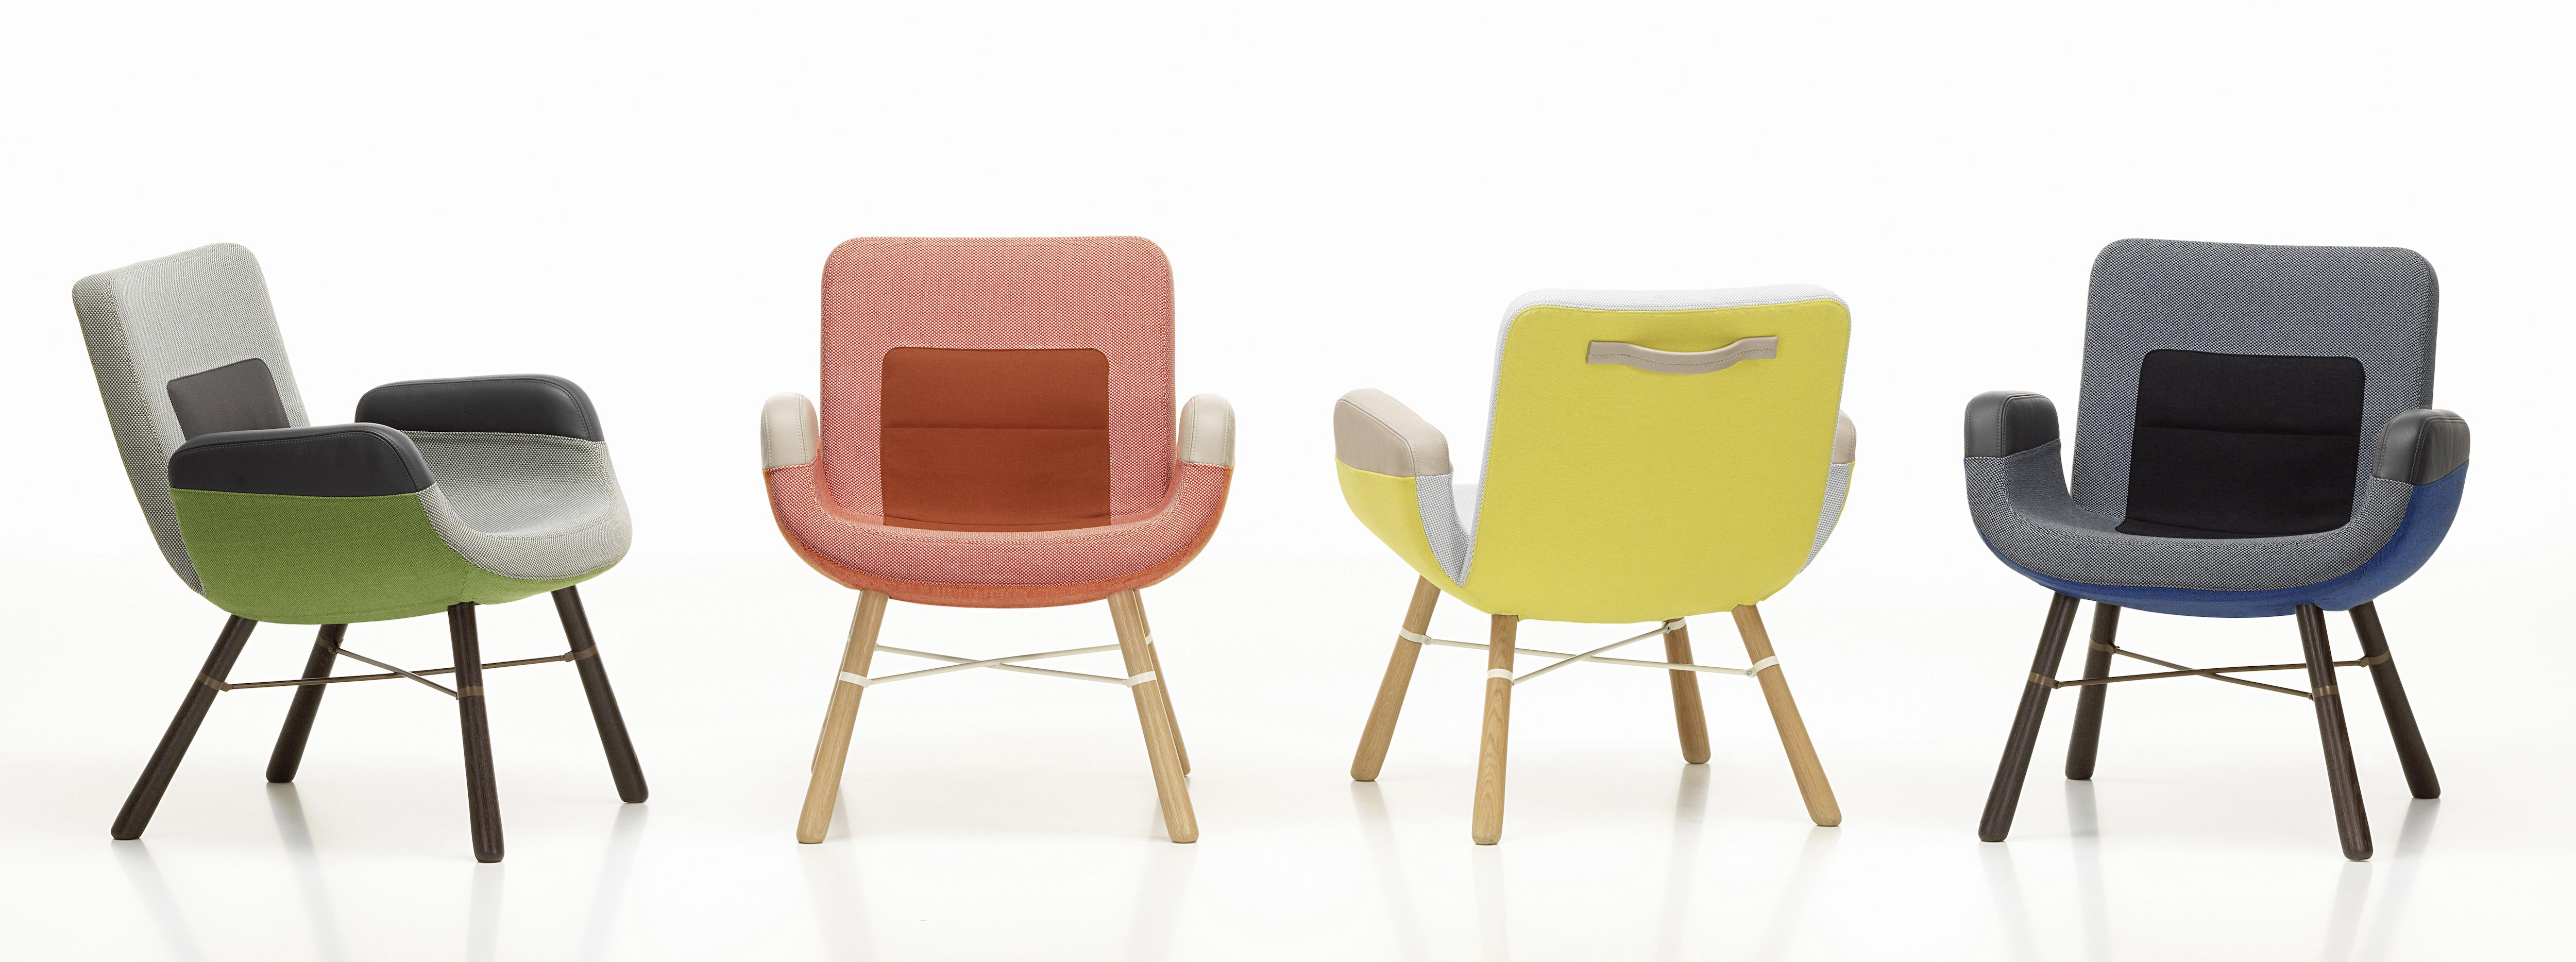 vitra east river chair hella jongerius. Black Bedroom Furniture Sets. Home Design Ideas